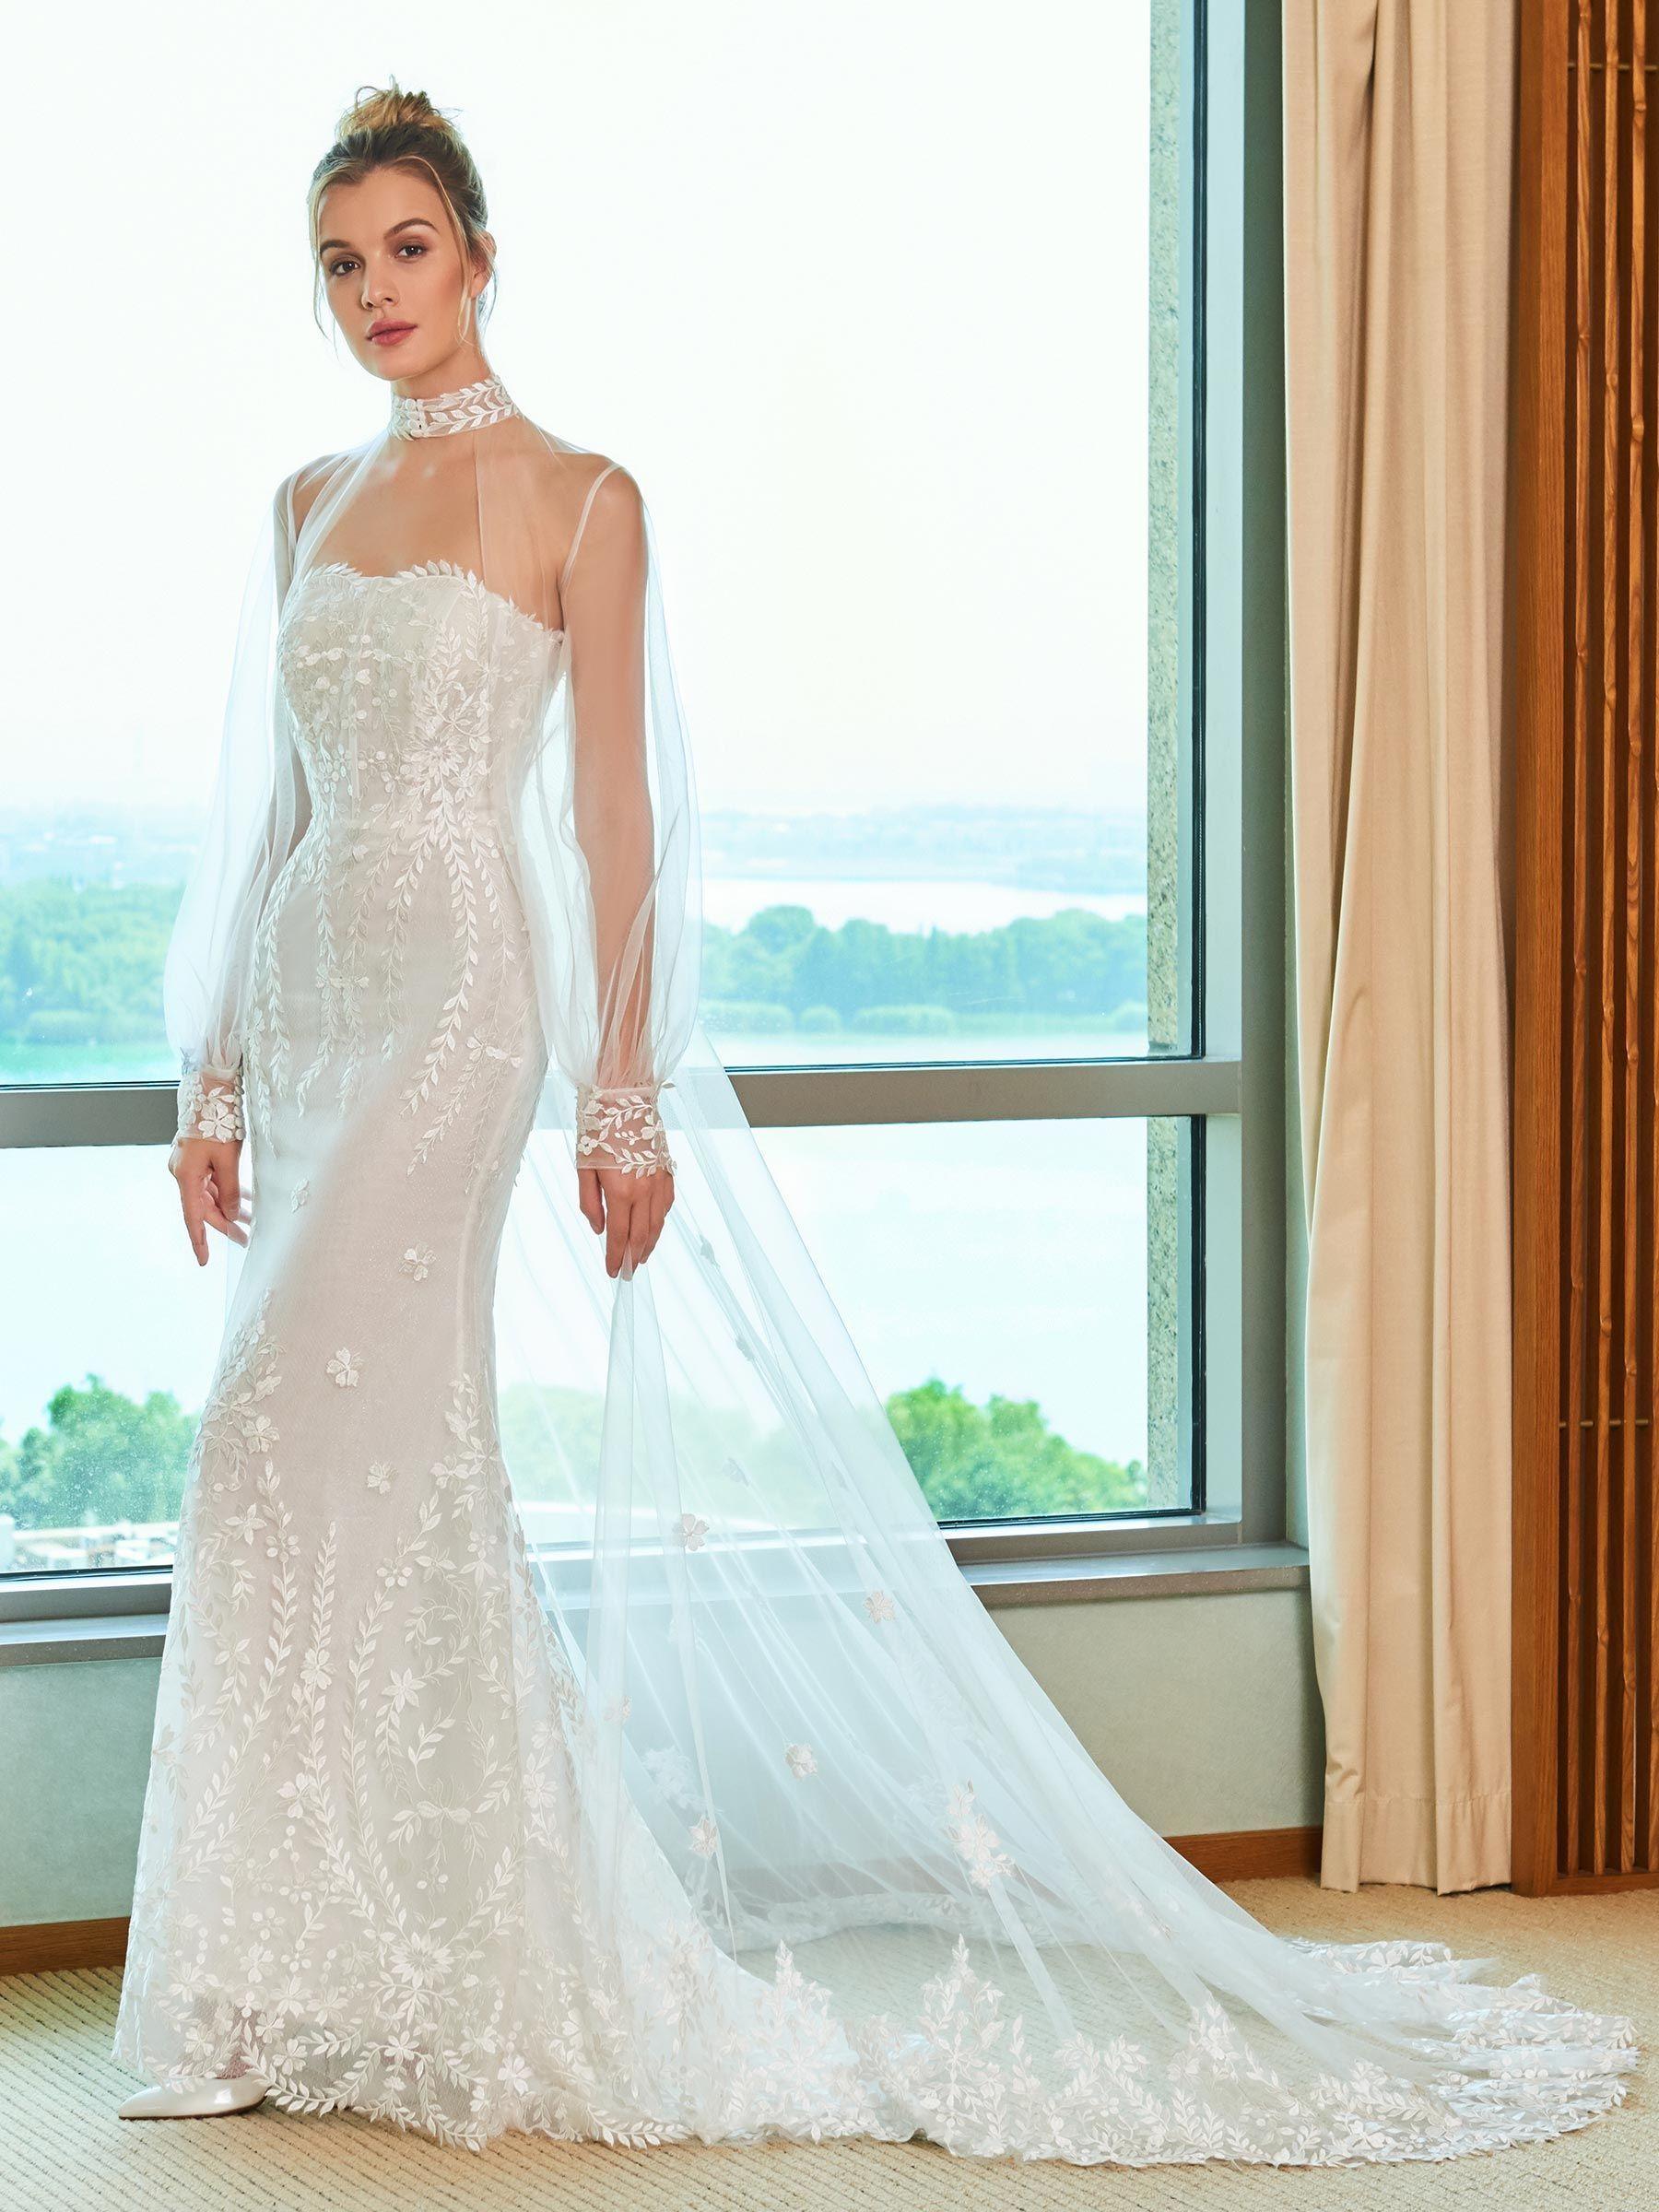 White mermaid wedding dress  Mermaid Lace Wedding Dress with Long Sleeve Jacket  Summer wedding